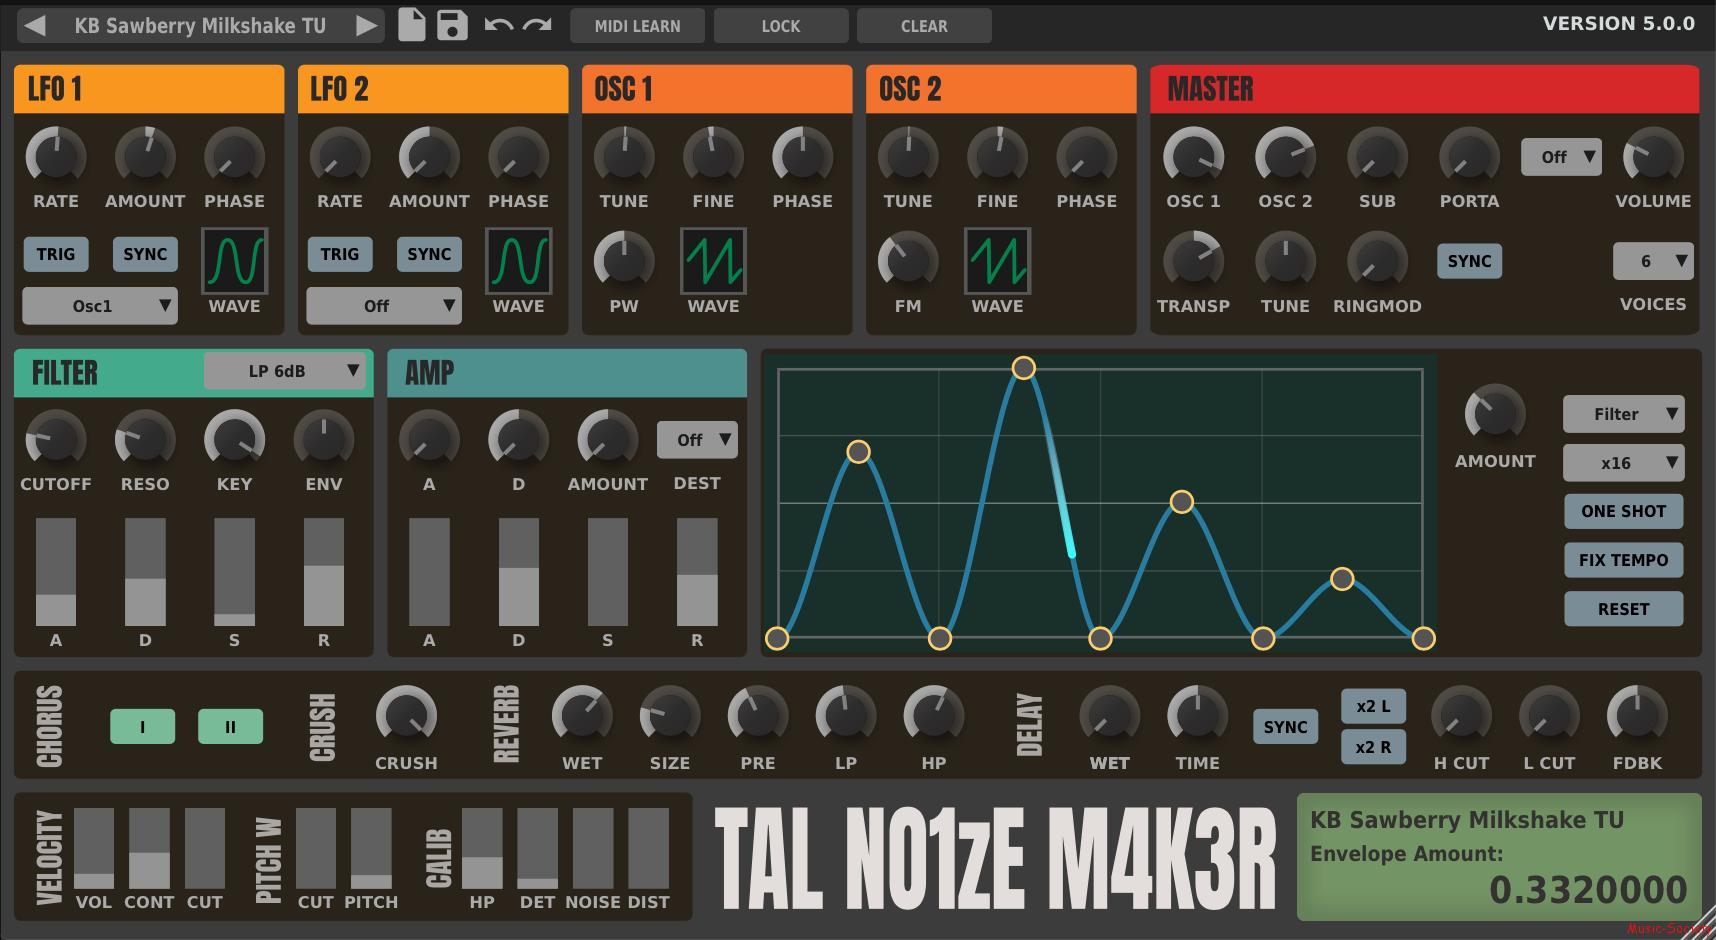 tal-noisemaker-new2